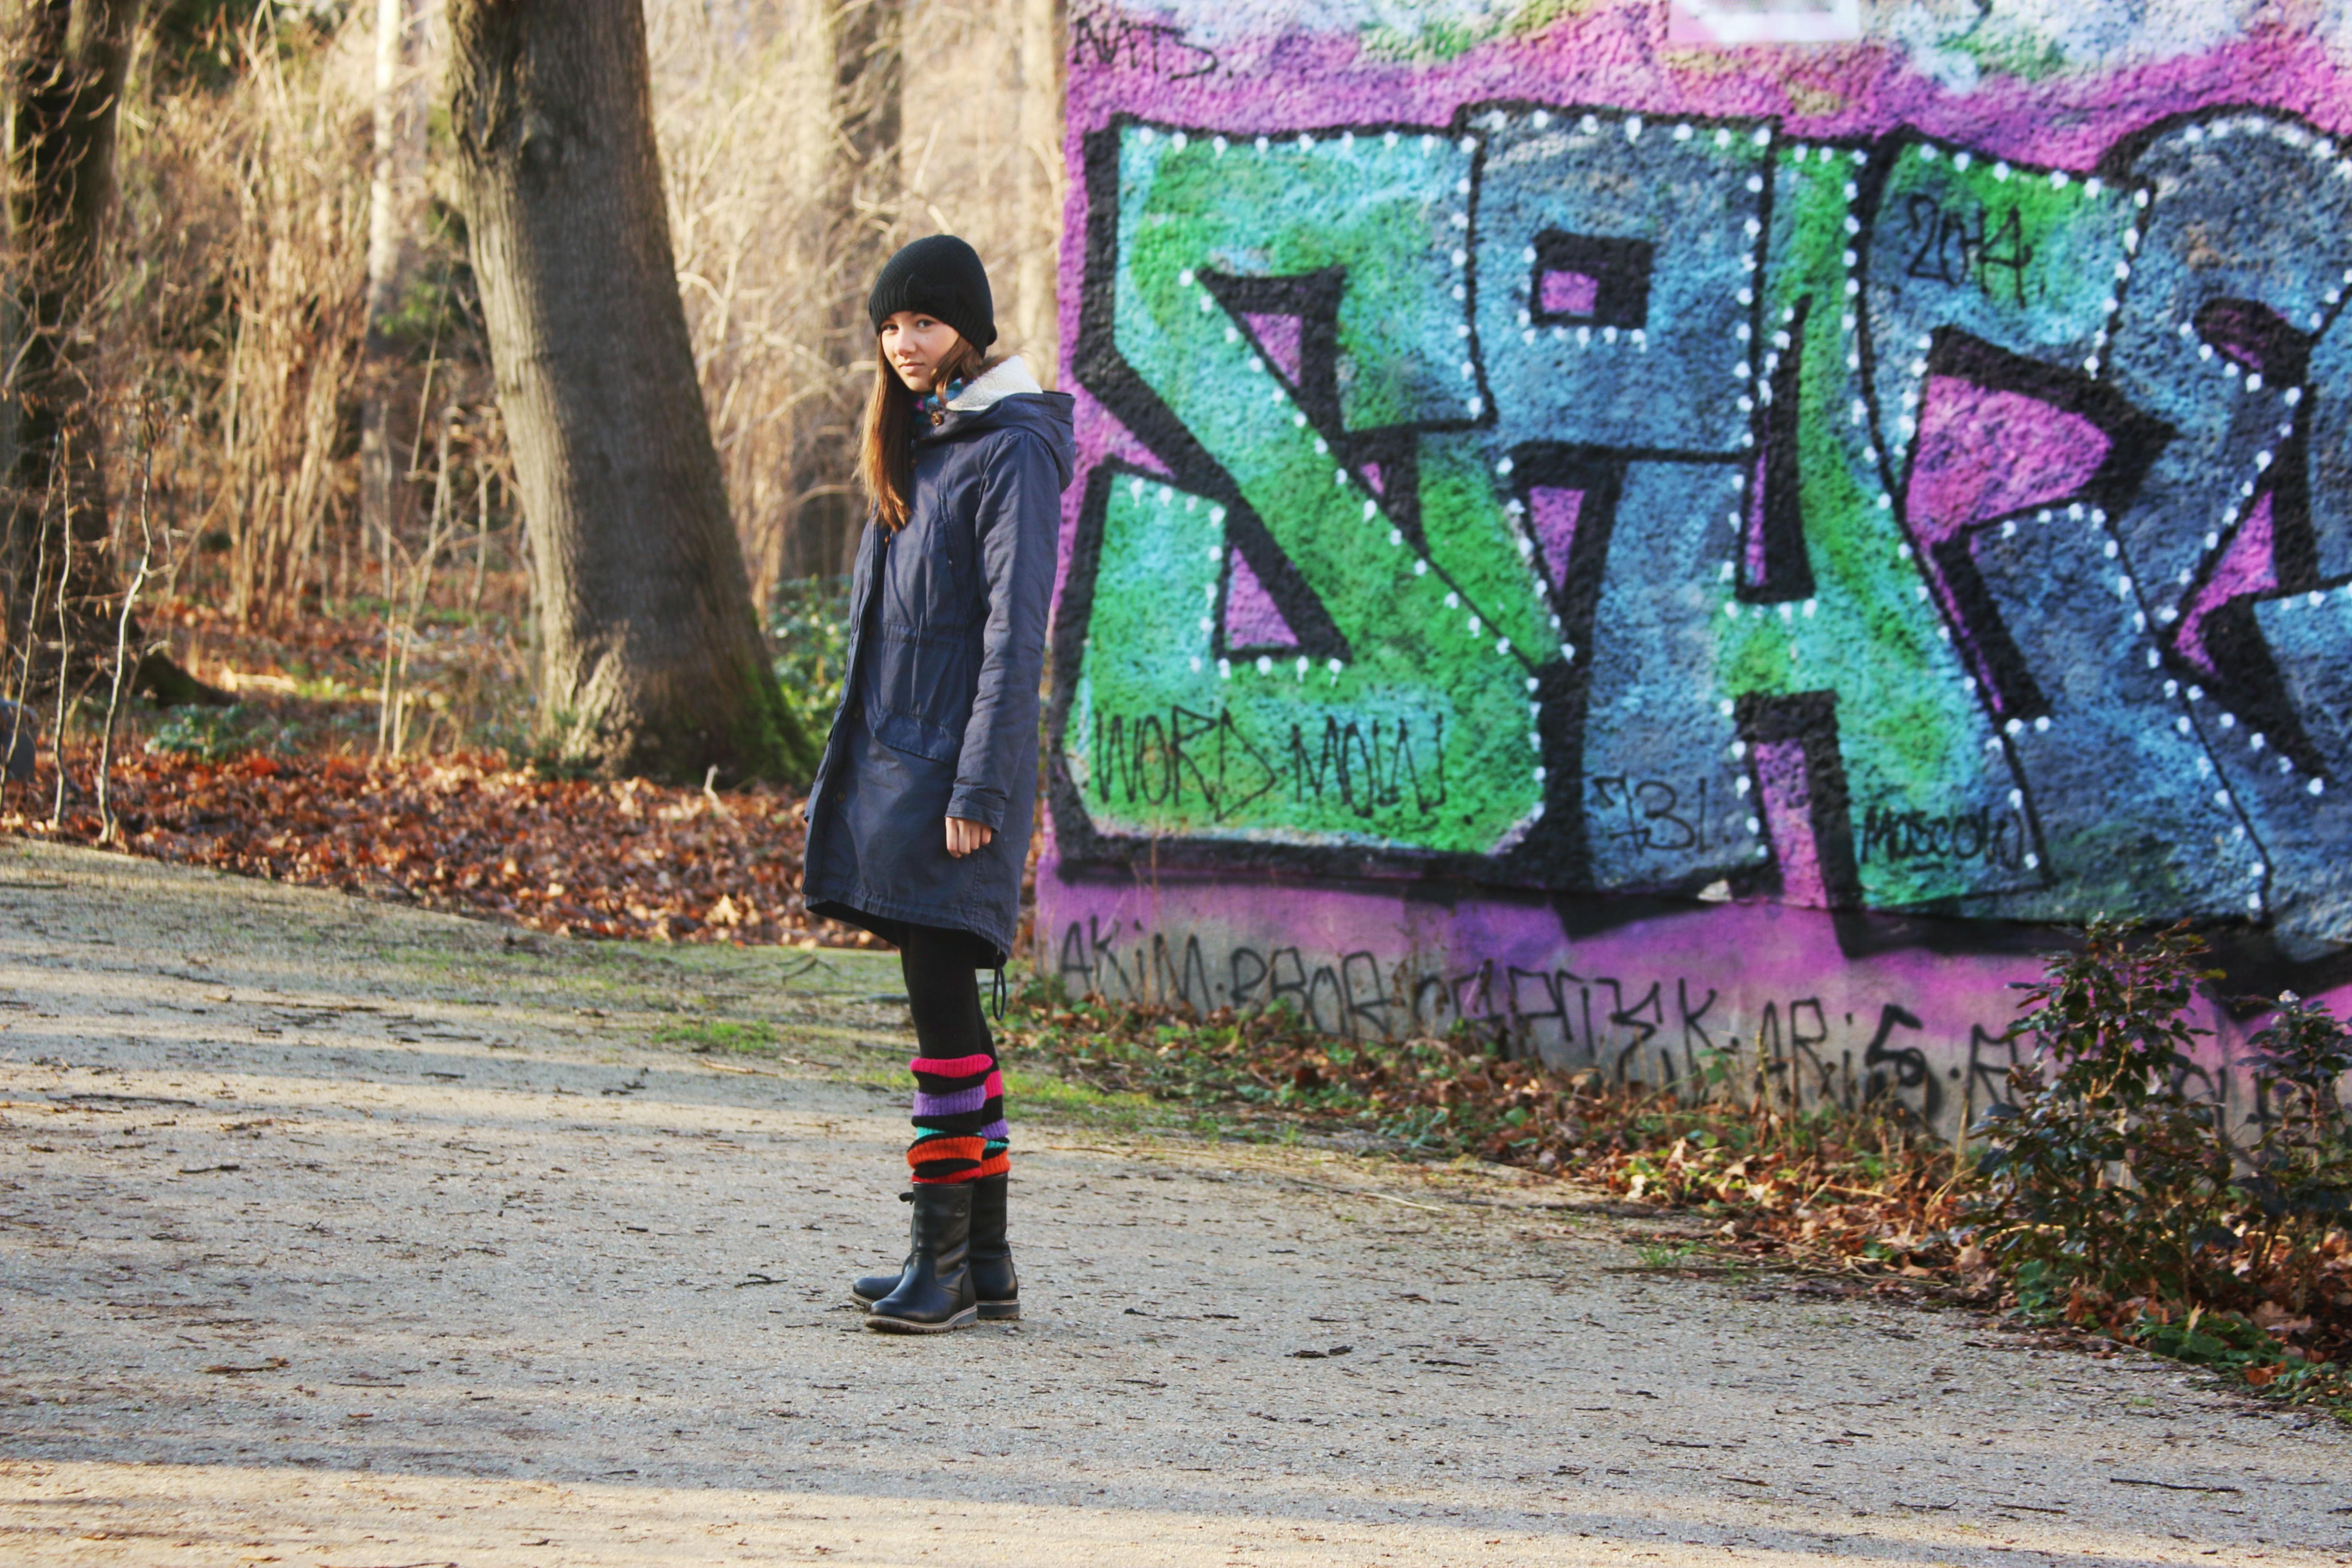 Sonntagsspaziergang, Sonne, Berlin, Familie, Berlinmittemom, Fernsehturm, Street Art, TV Tower, Telespargel, Fotografie, Photodiary